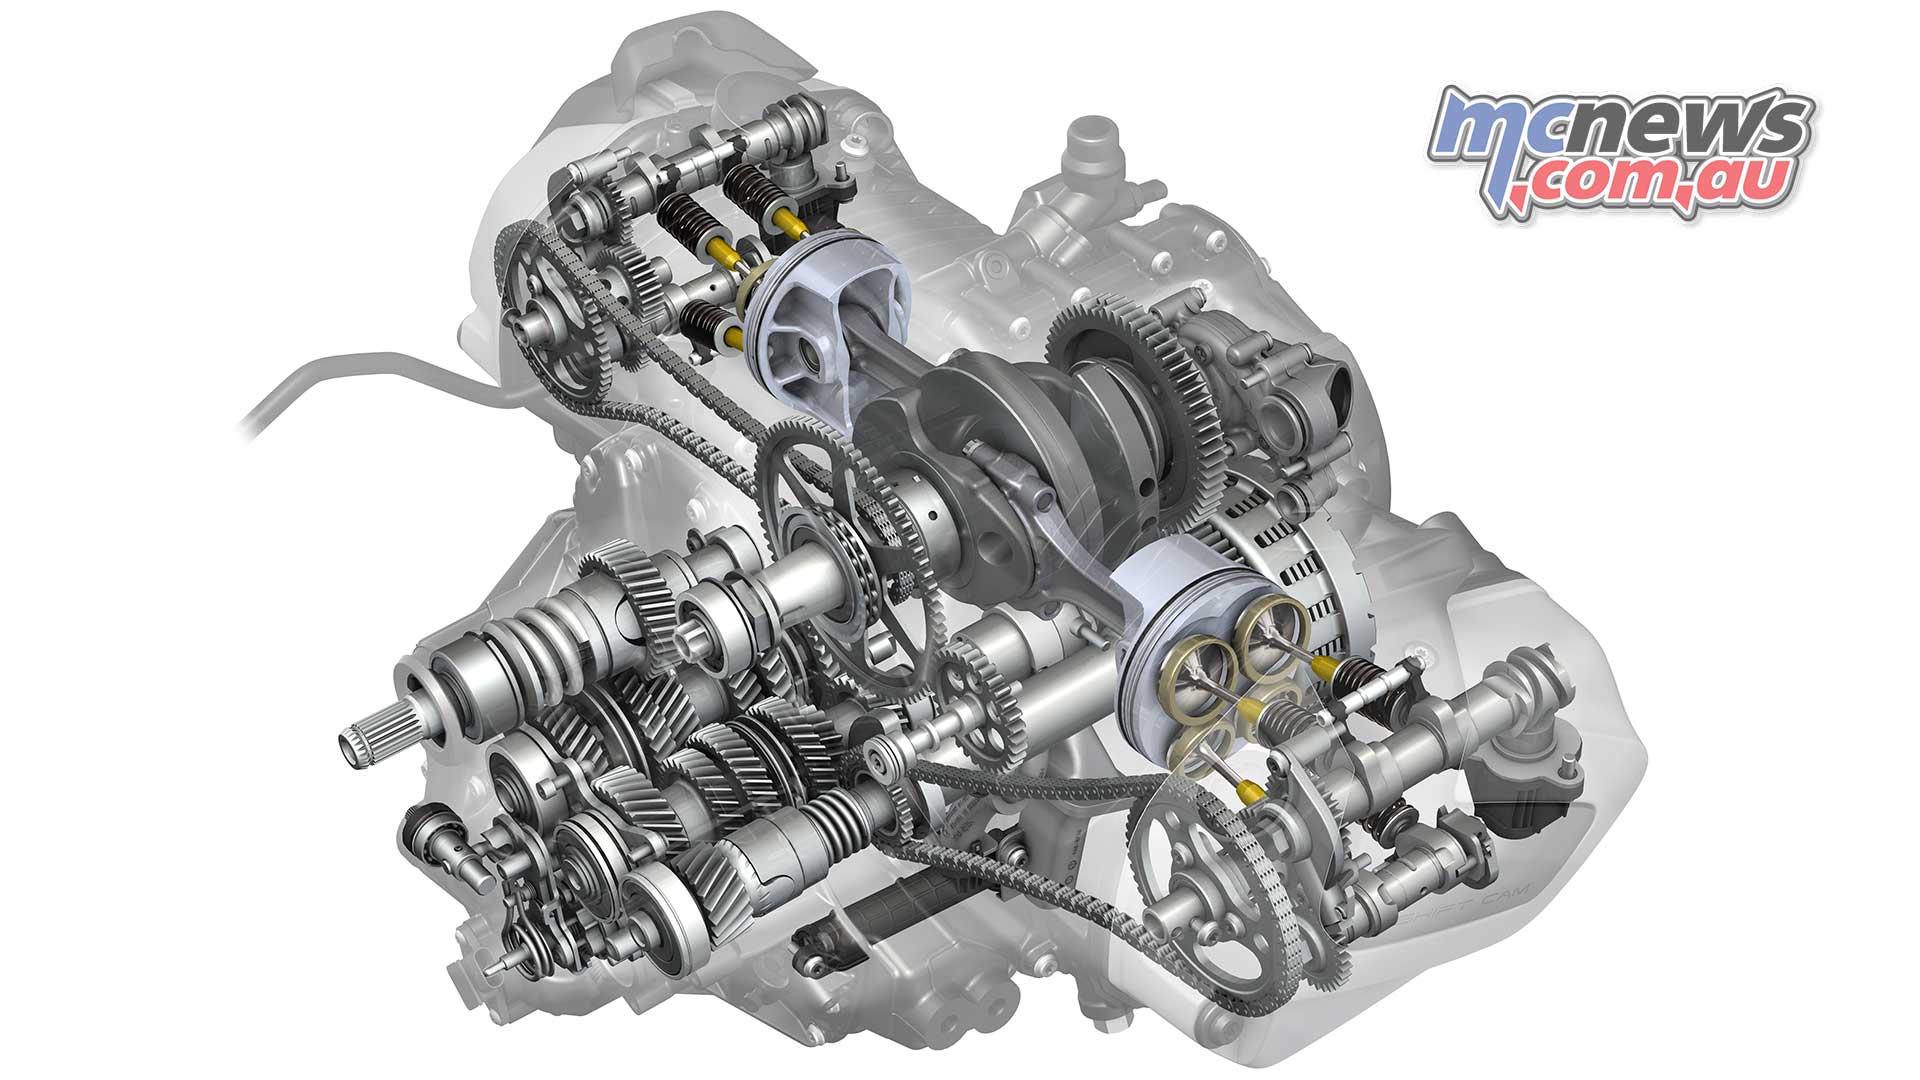 New 1254cc Bmw Boxer Engine 14 More Torque Double Overhead Cam Diagram Rgs Rt Technical Head